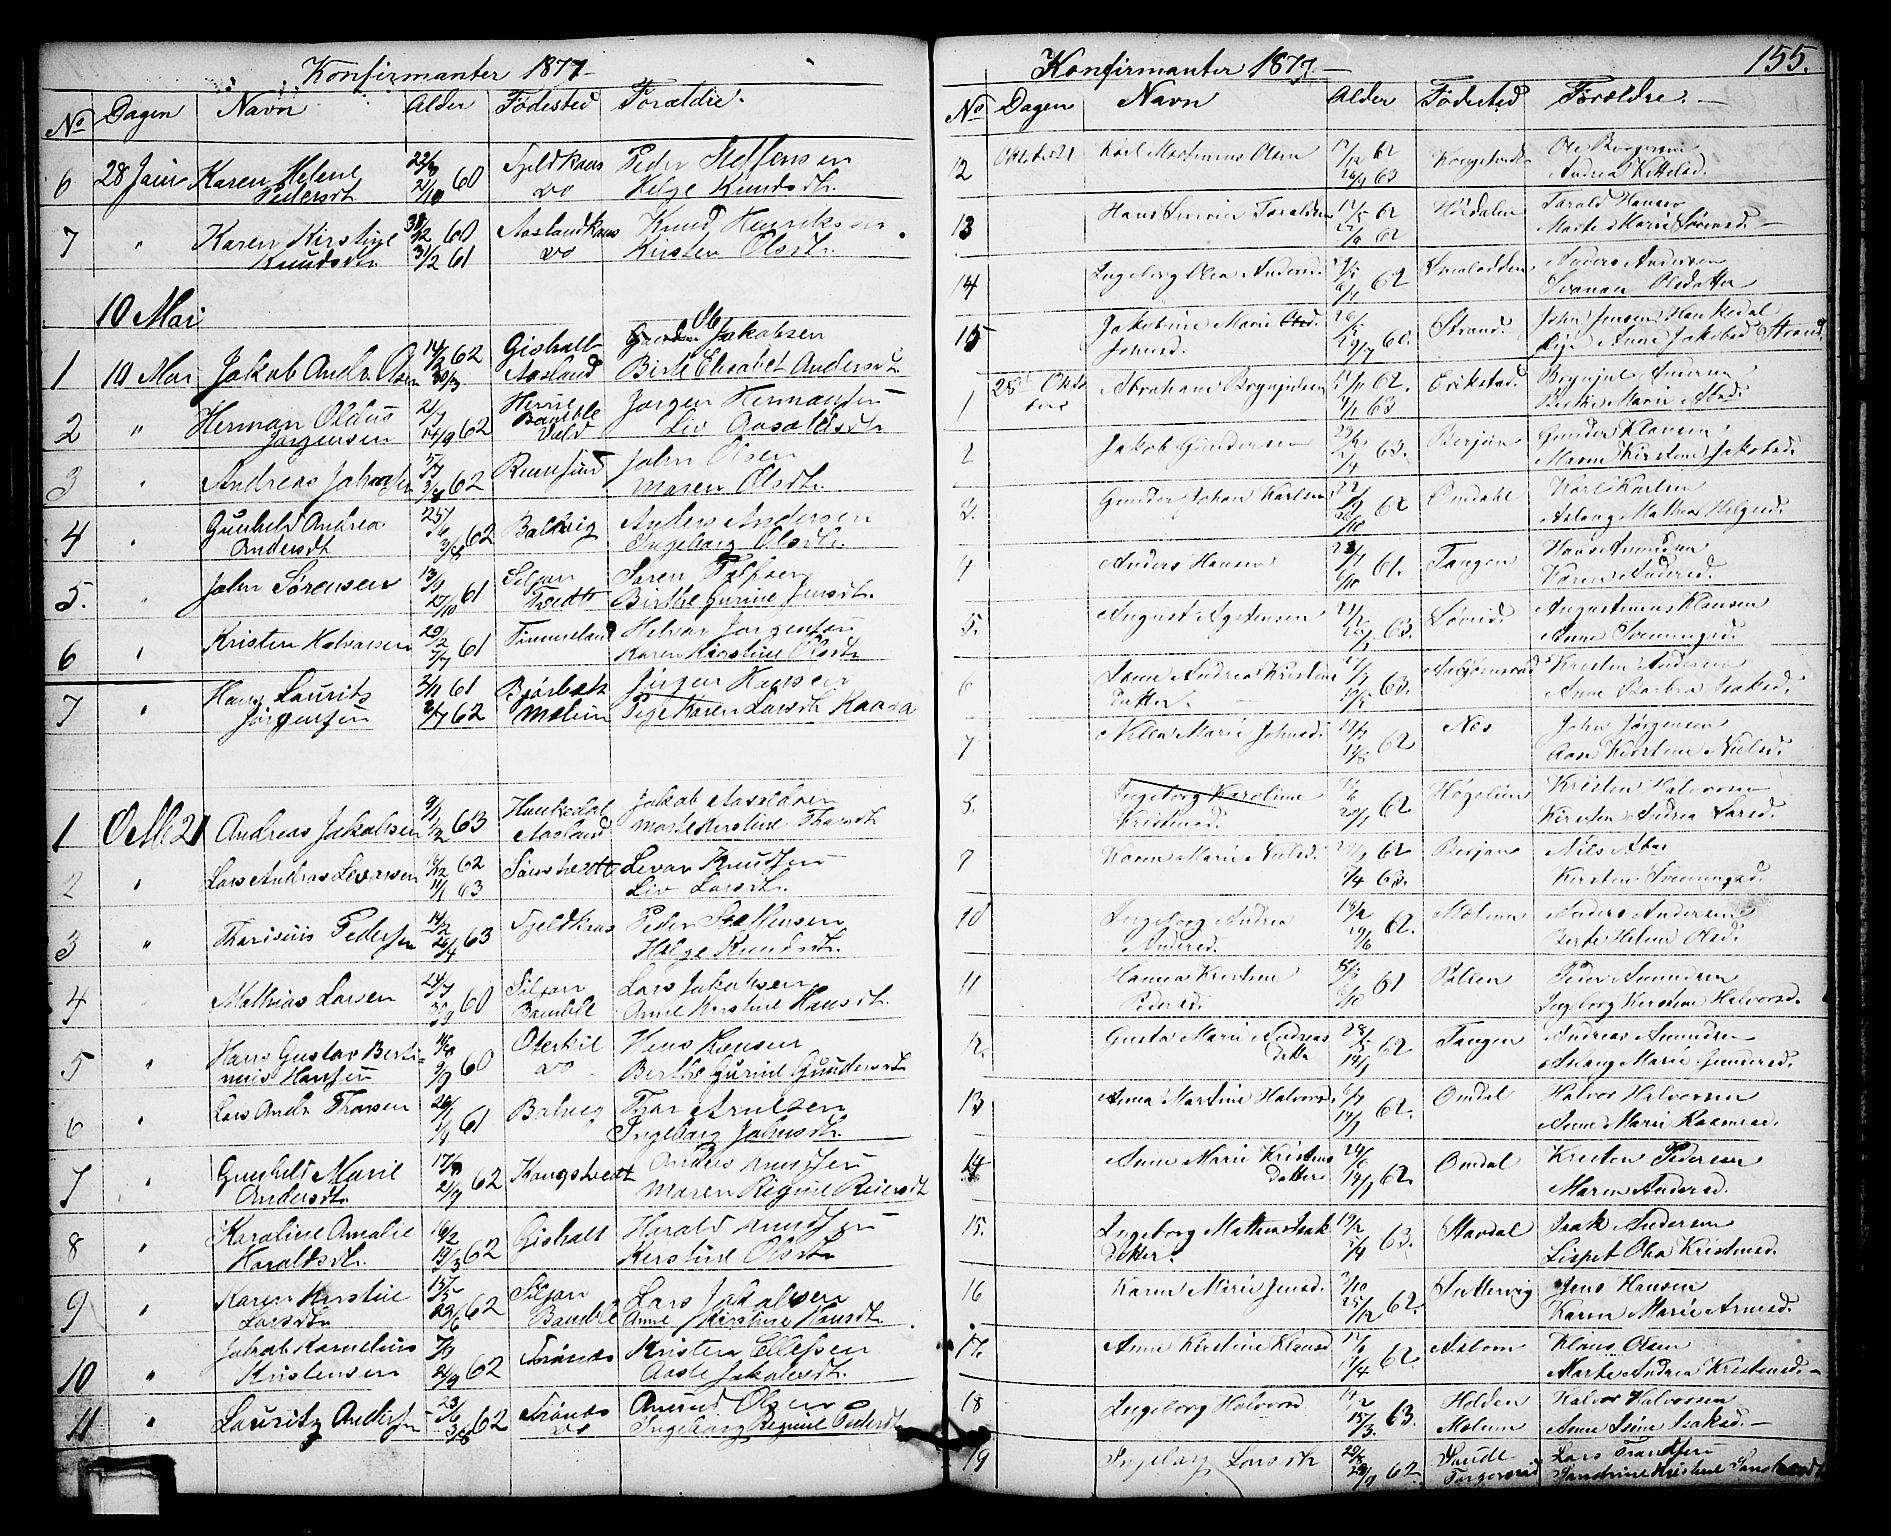 SAKO, Solum kirkebøker, G/Gb/L0002: Klokkerbok nr. II 2, 1859-1879, s. 155